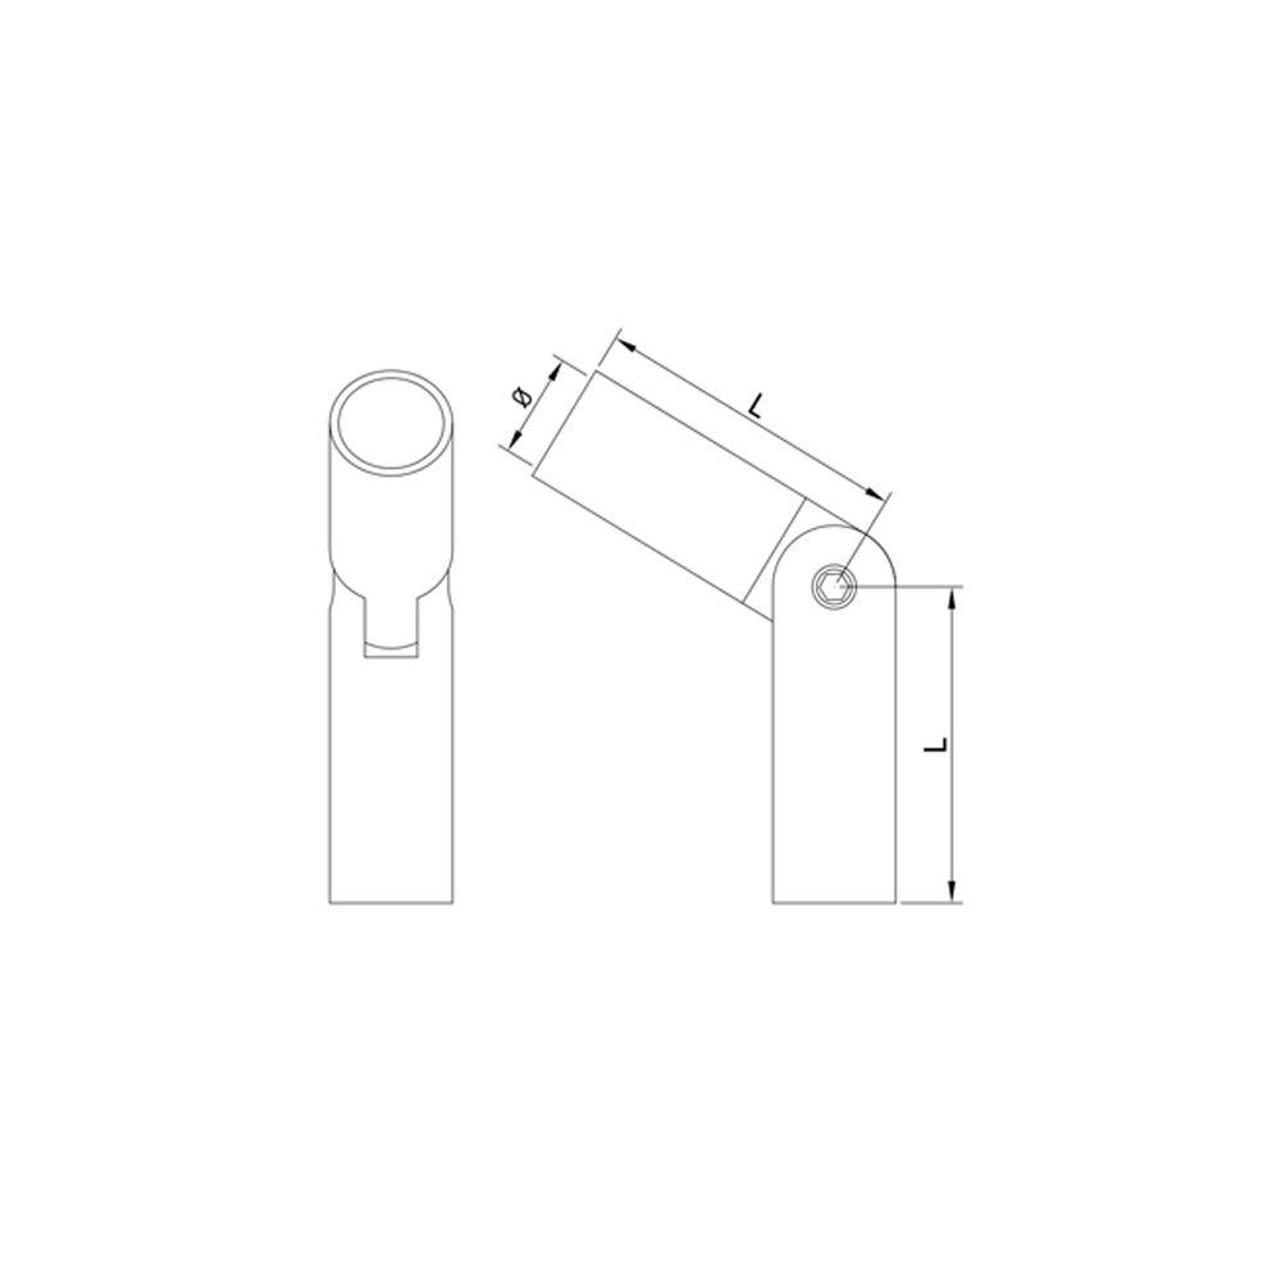 12 mm Round Bar Adjustable Round Bar Connector CADD Drawing